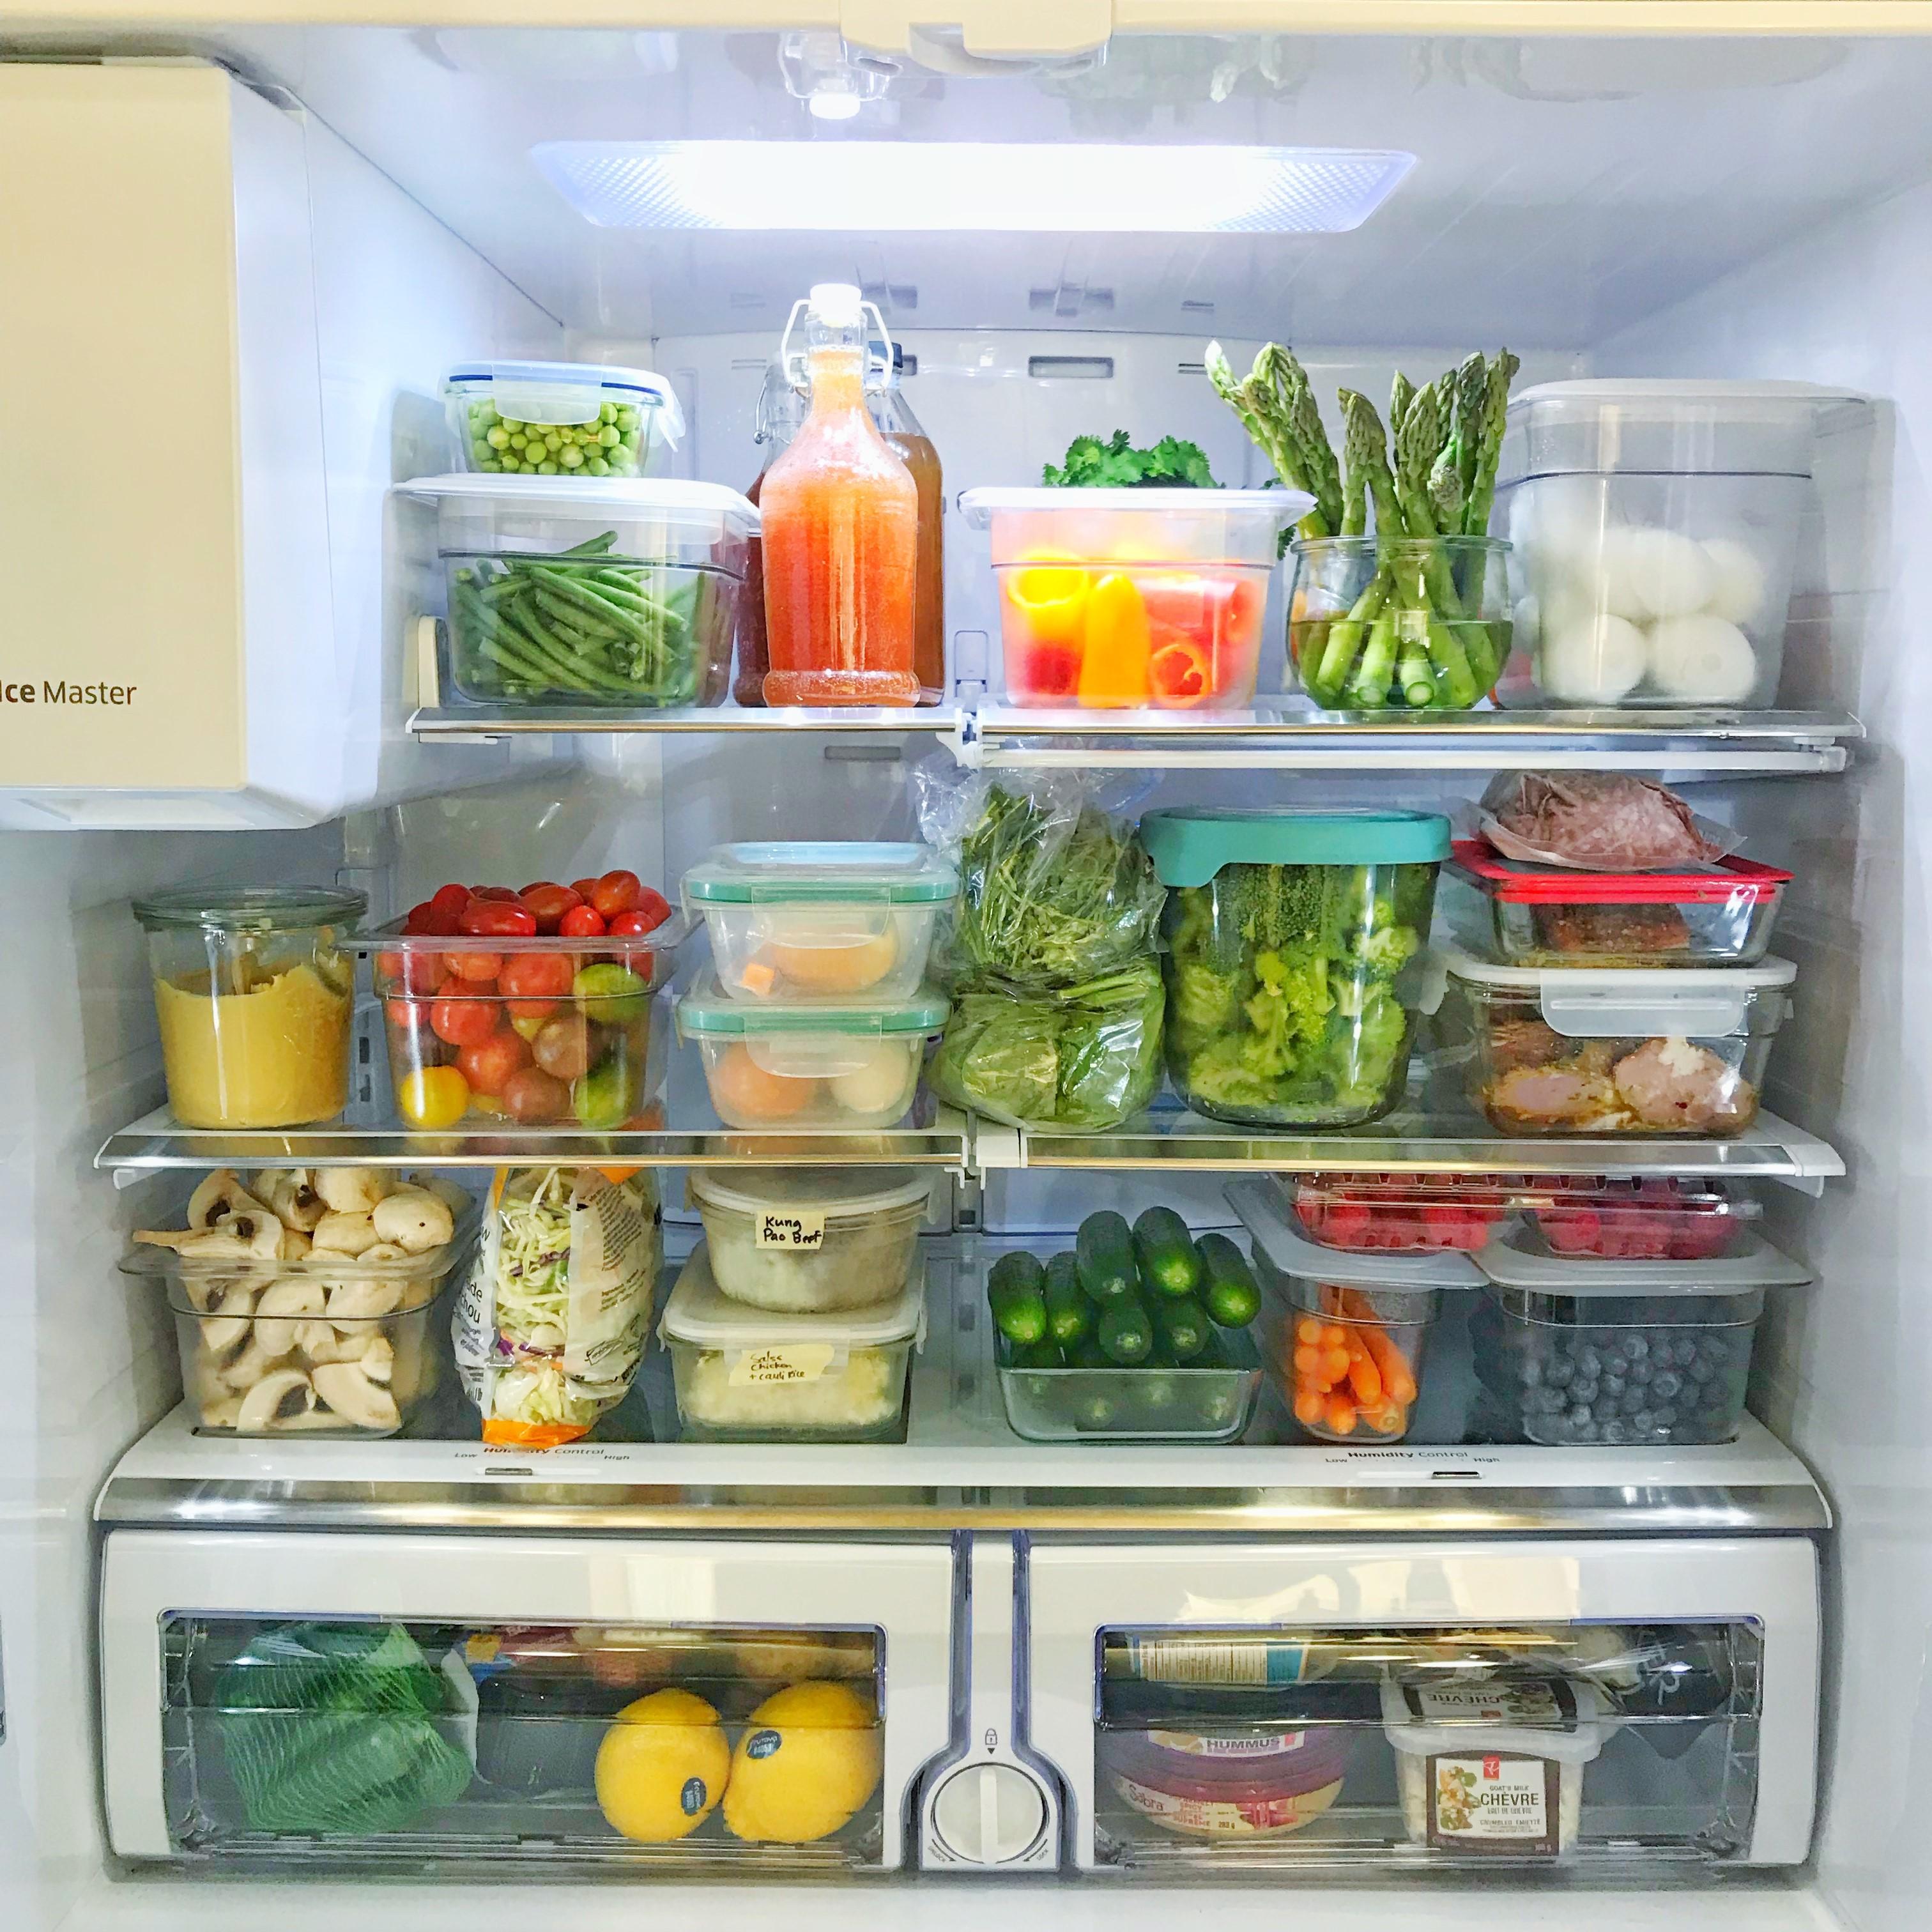 beautiful fridge with meal prep ingredients